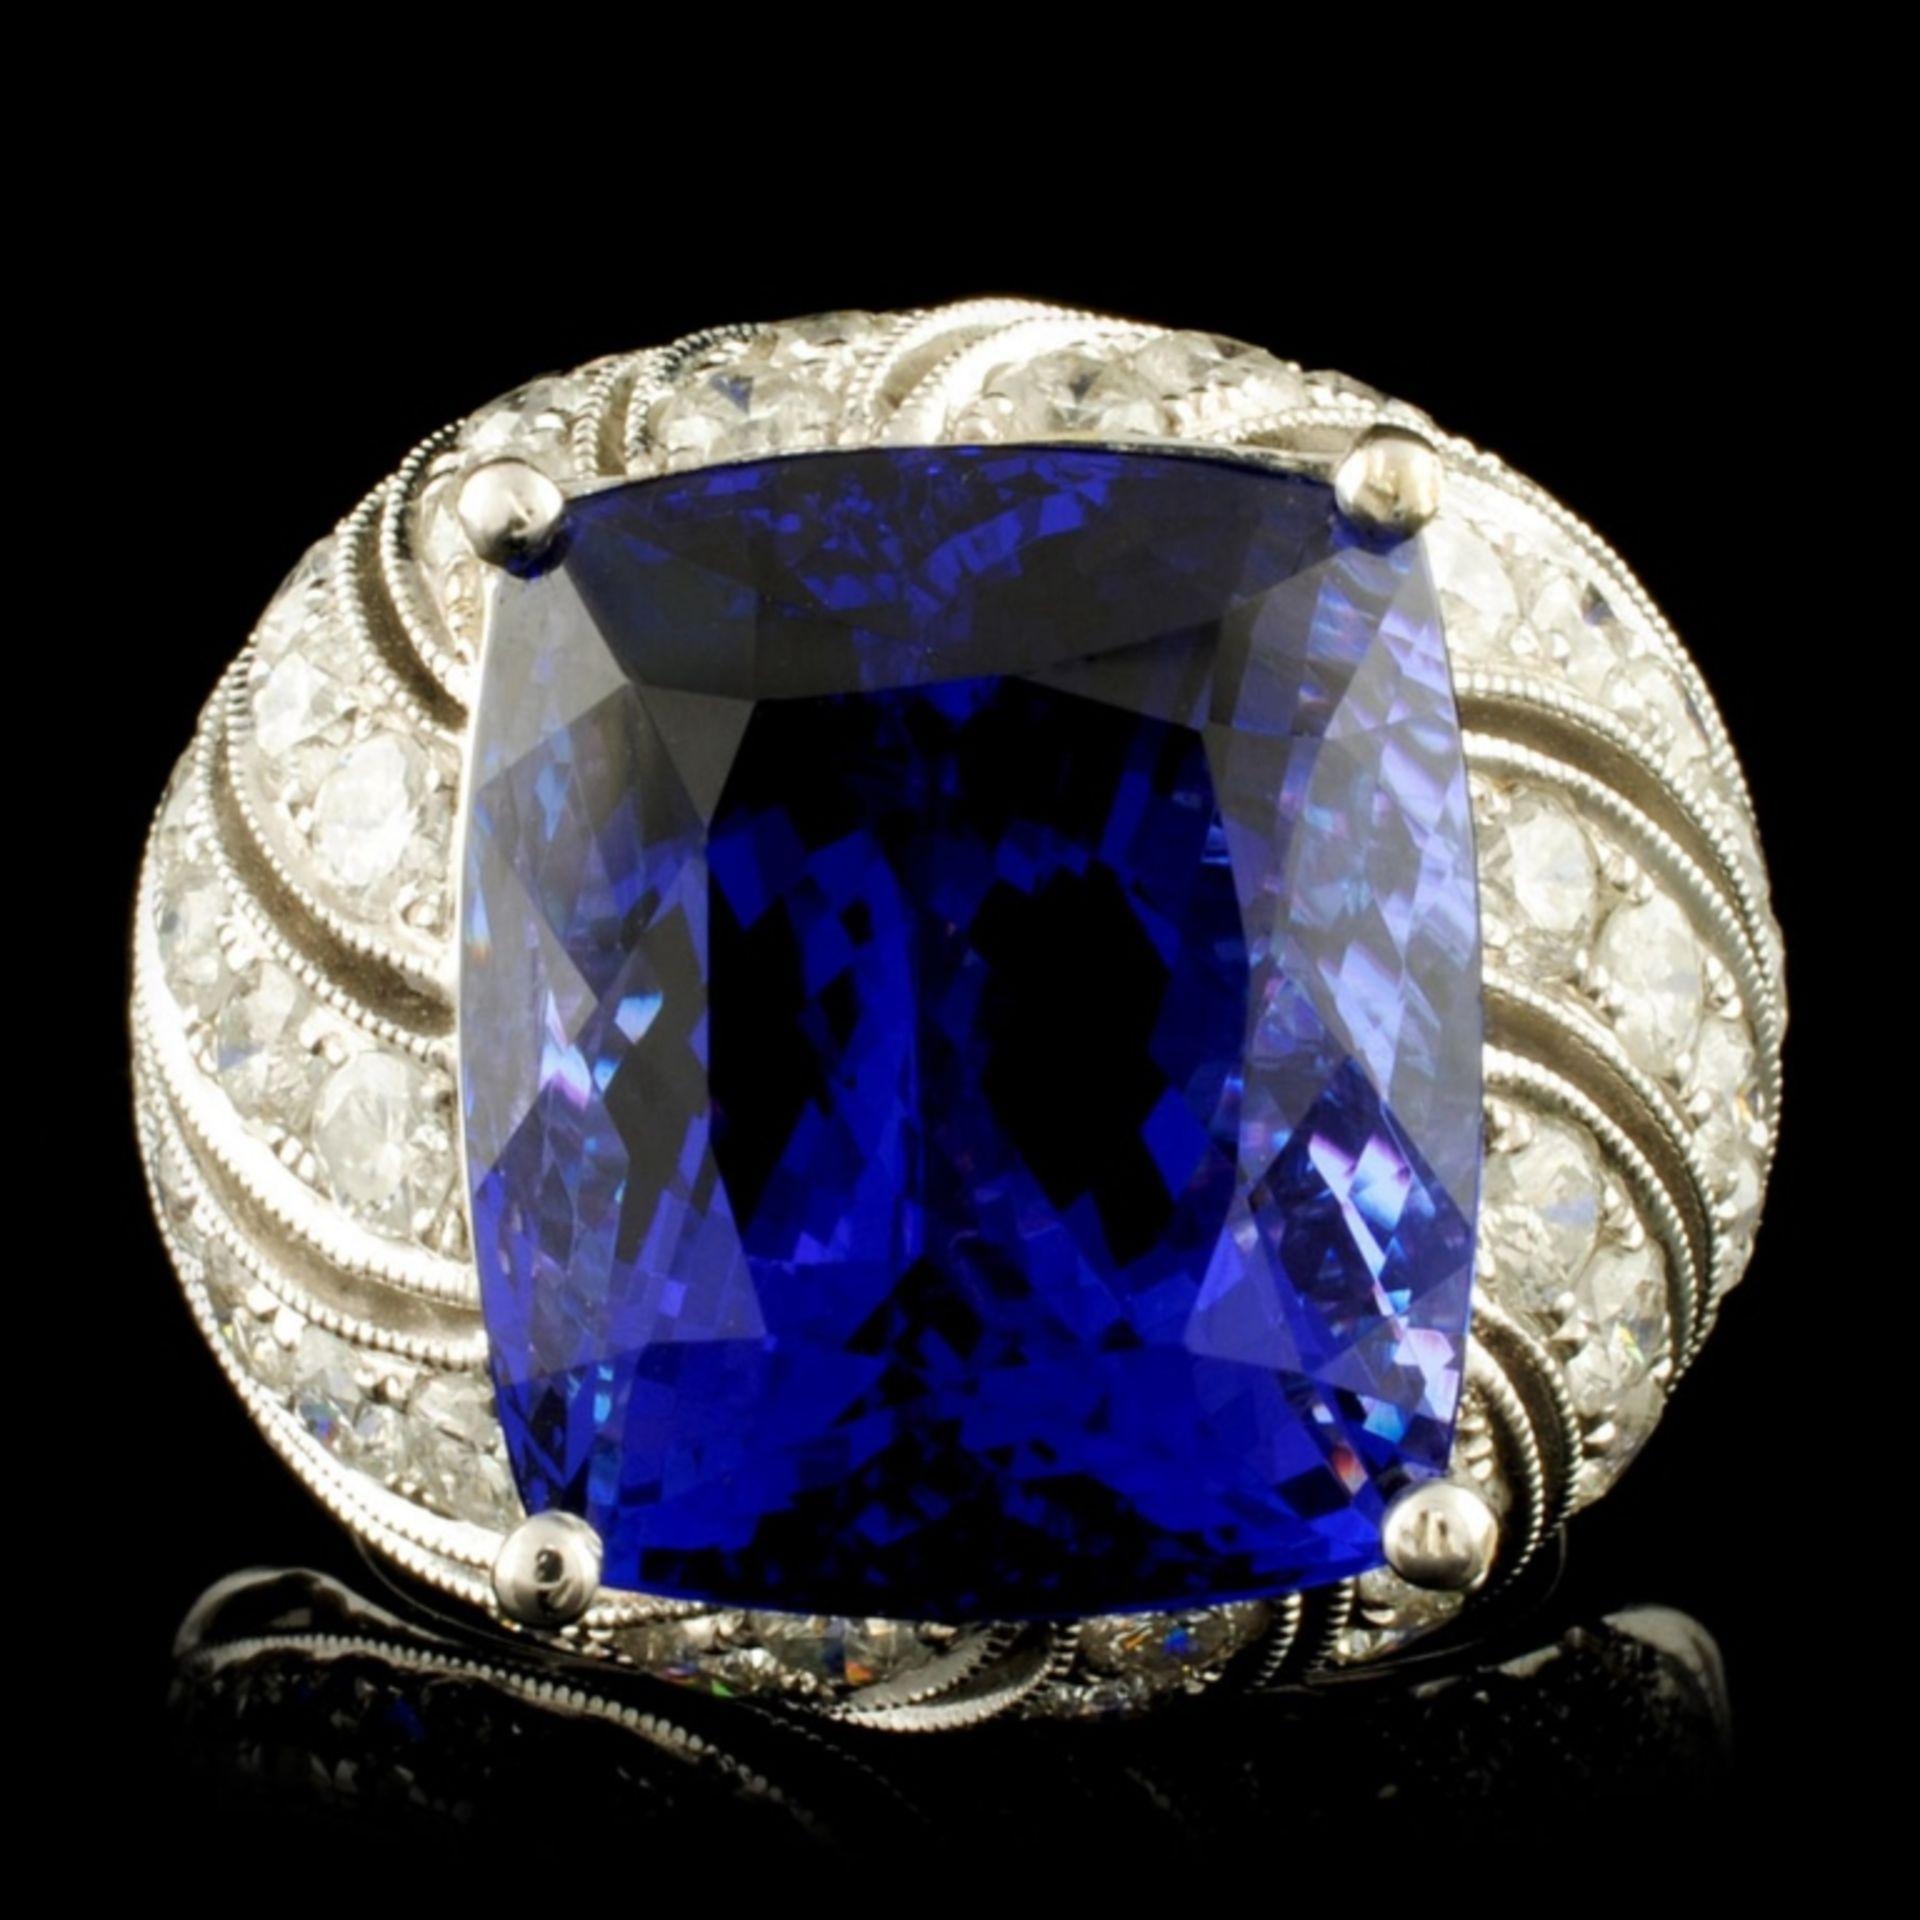 18K Gold 16.72ct Tanzanite & 2.78ctw Diamond Ring